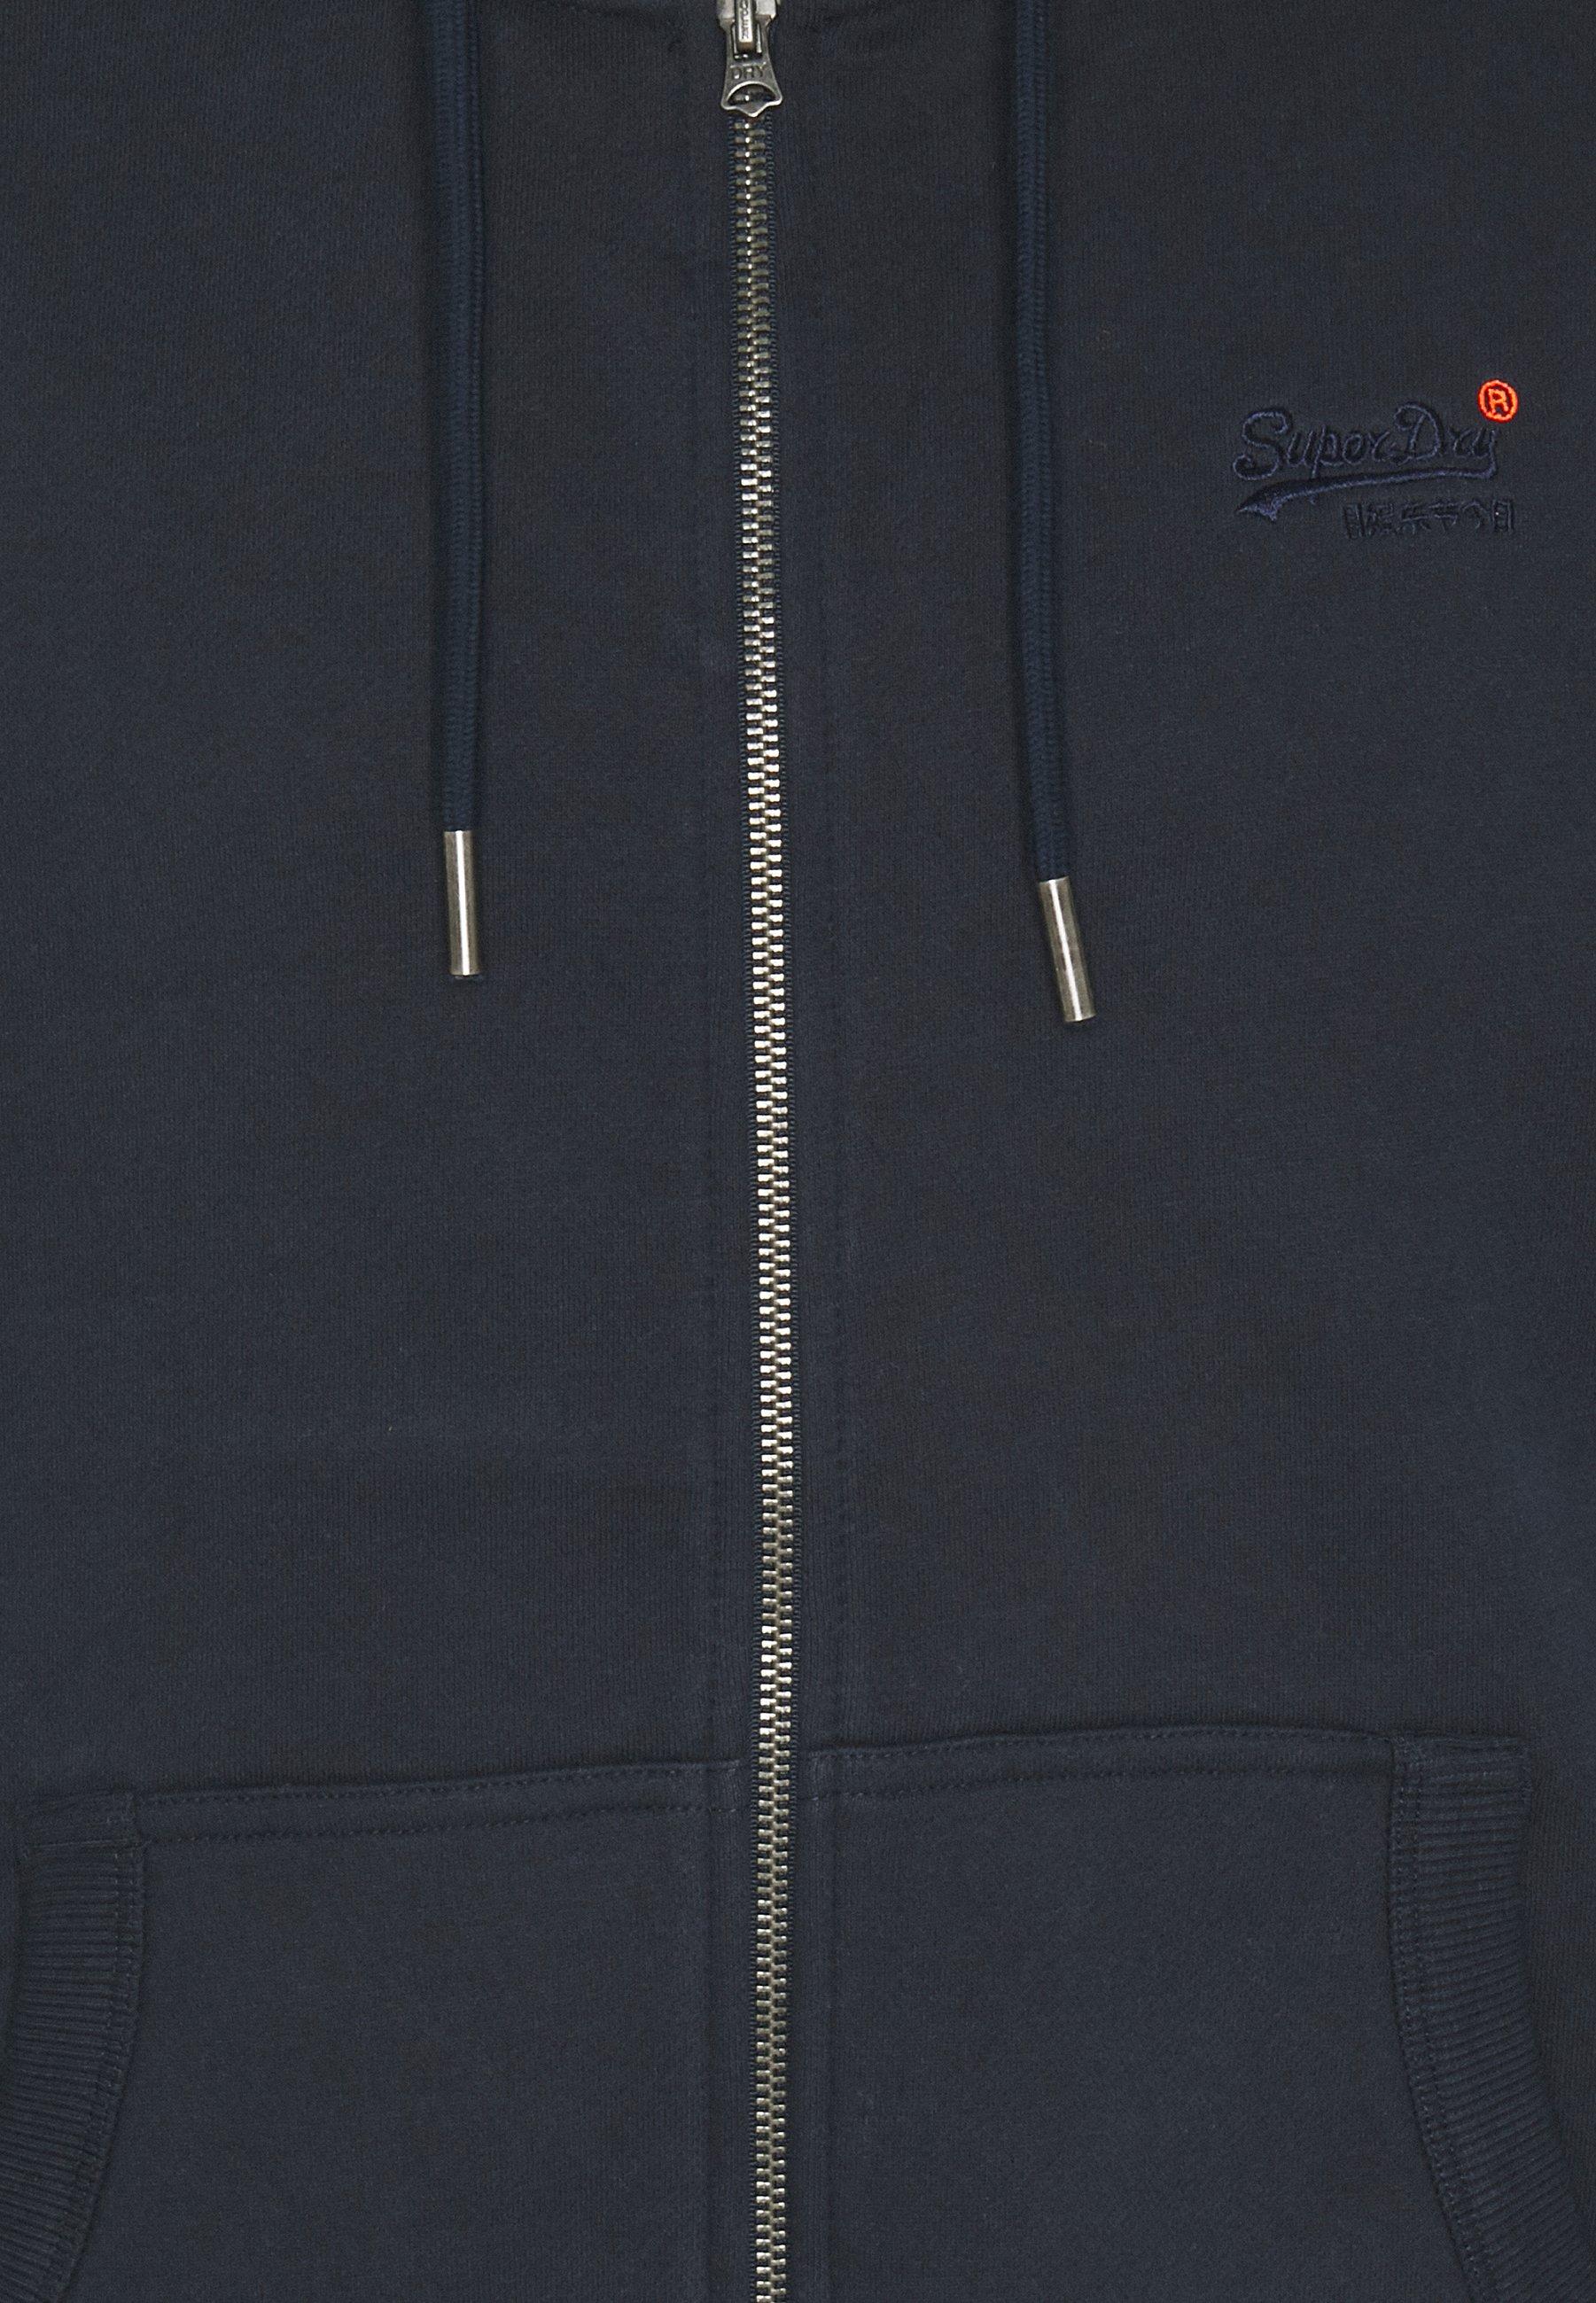 Superdry CLASSIC ZIPHOOD - Sweatjacke - rich navy/dunkelblau - Herrenwinterkleidung PV7IU